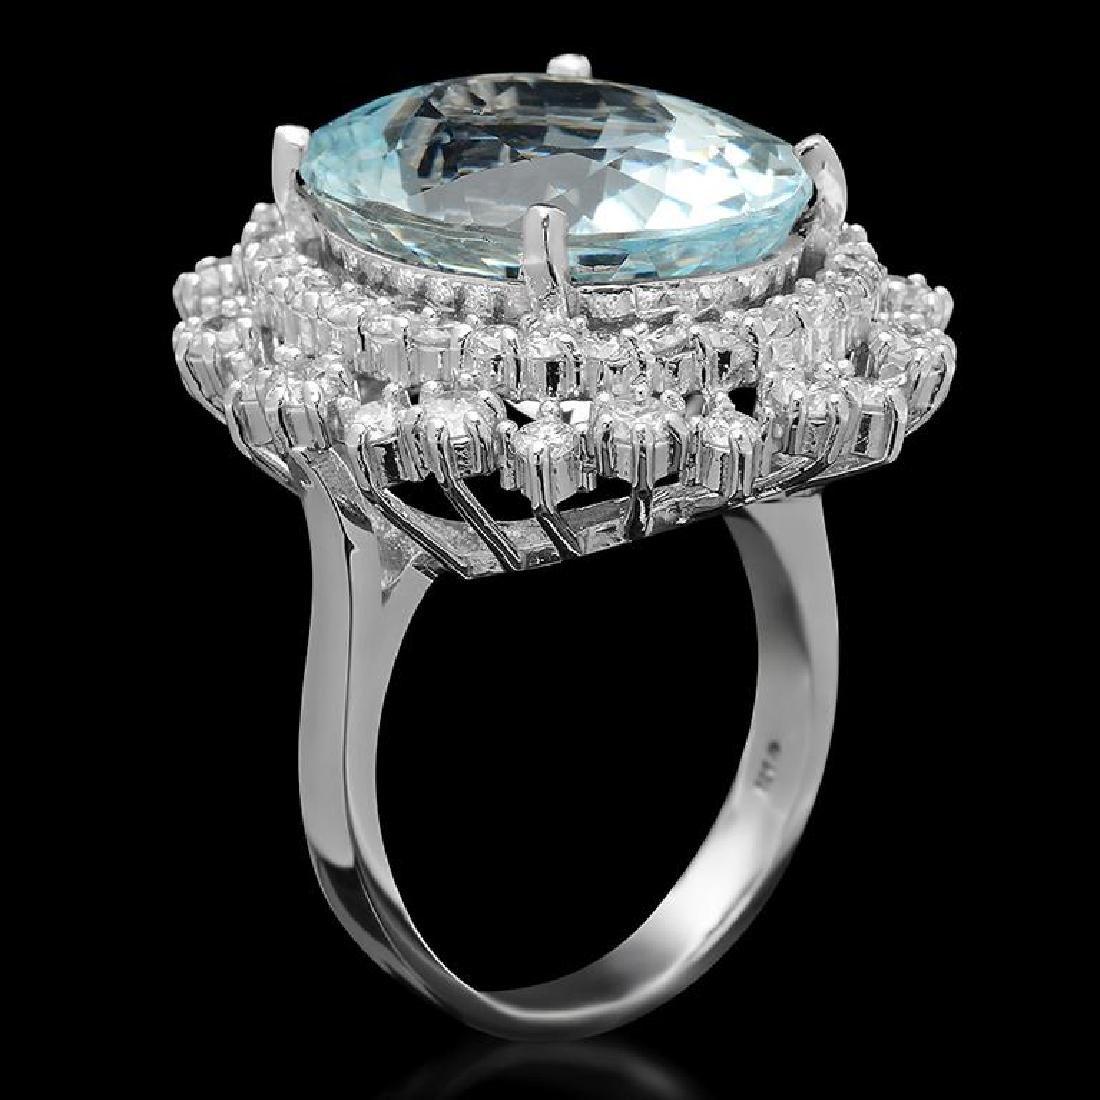 14K Gold 12.15ct Aquamarine 1.75ct Diamond Ring - 2